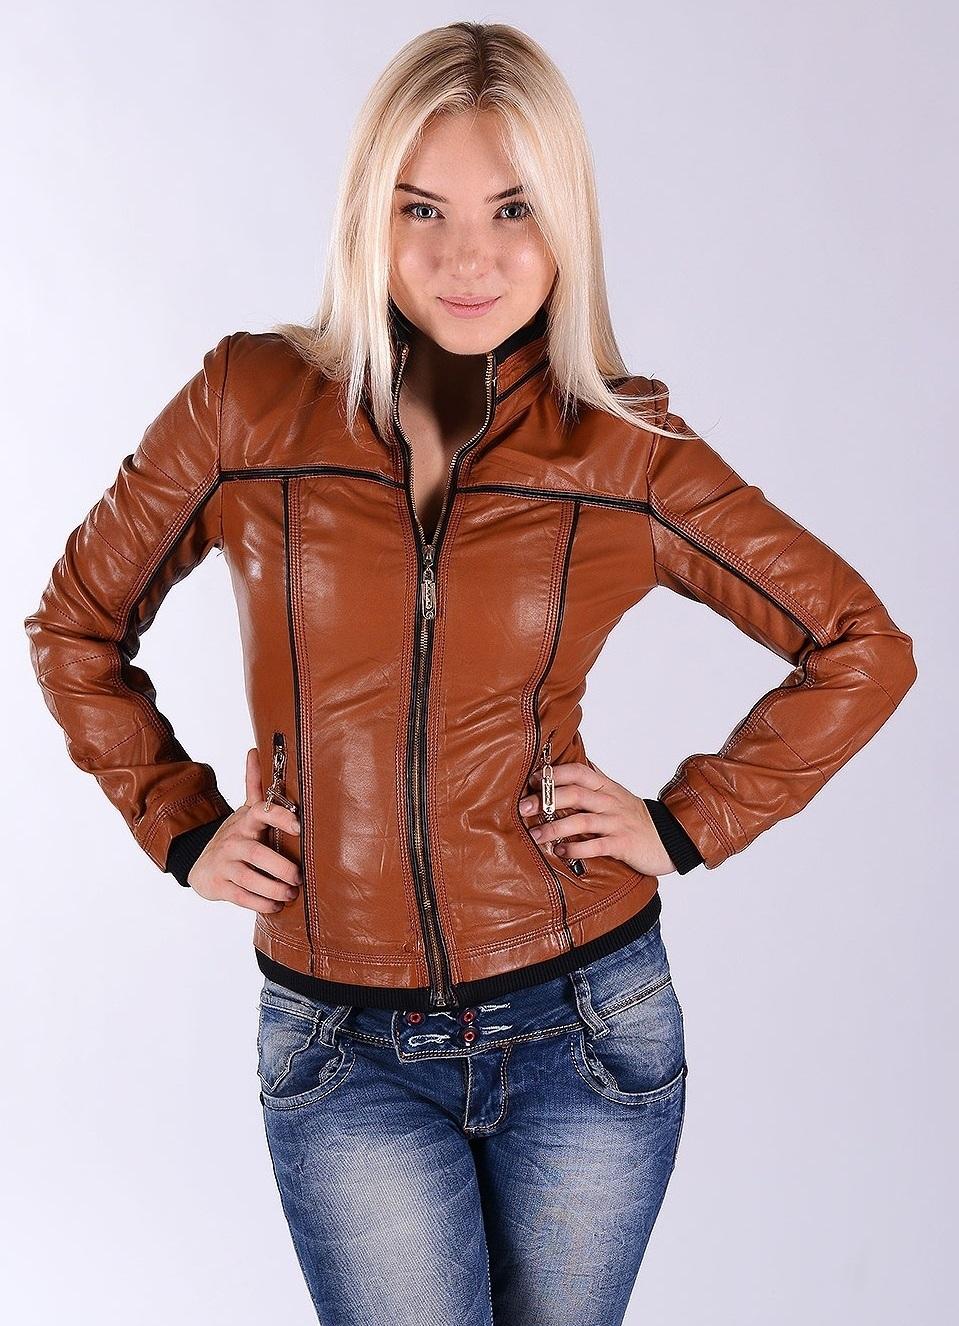 sezonmoda.ru - Осенние куртки женские. . Grand Trend. . Модель:КУРТКА DREAM 1318 Артикул:3797